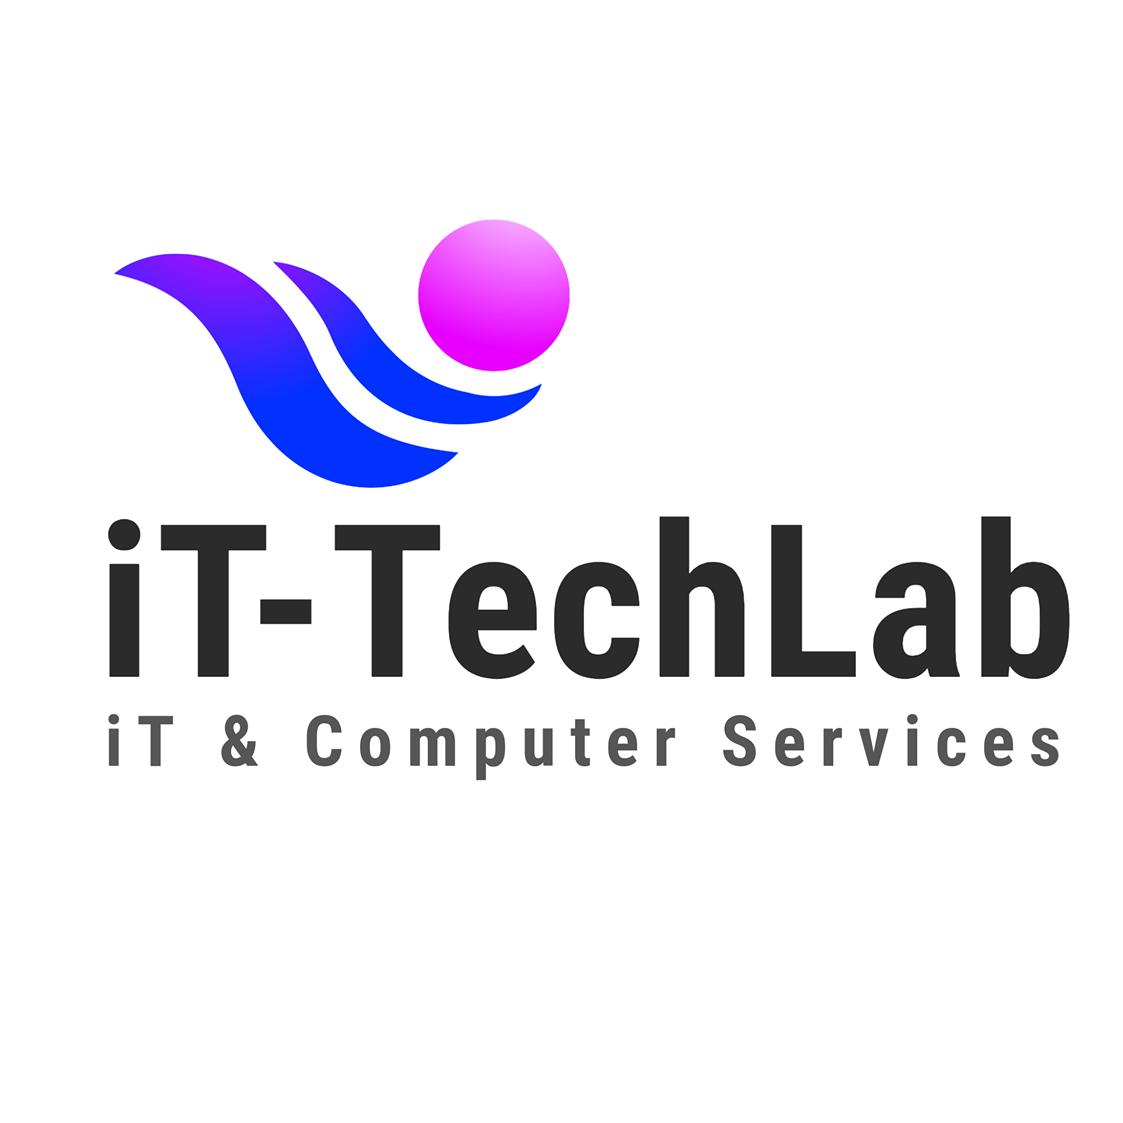 iT-TechLab - Επισκευή Laptop - PC Service - Υποστήριξη Δικτύων - Ανάκτηση Δεδομένων